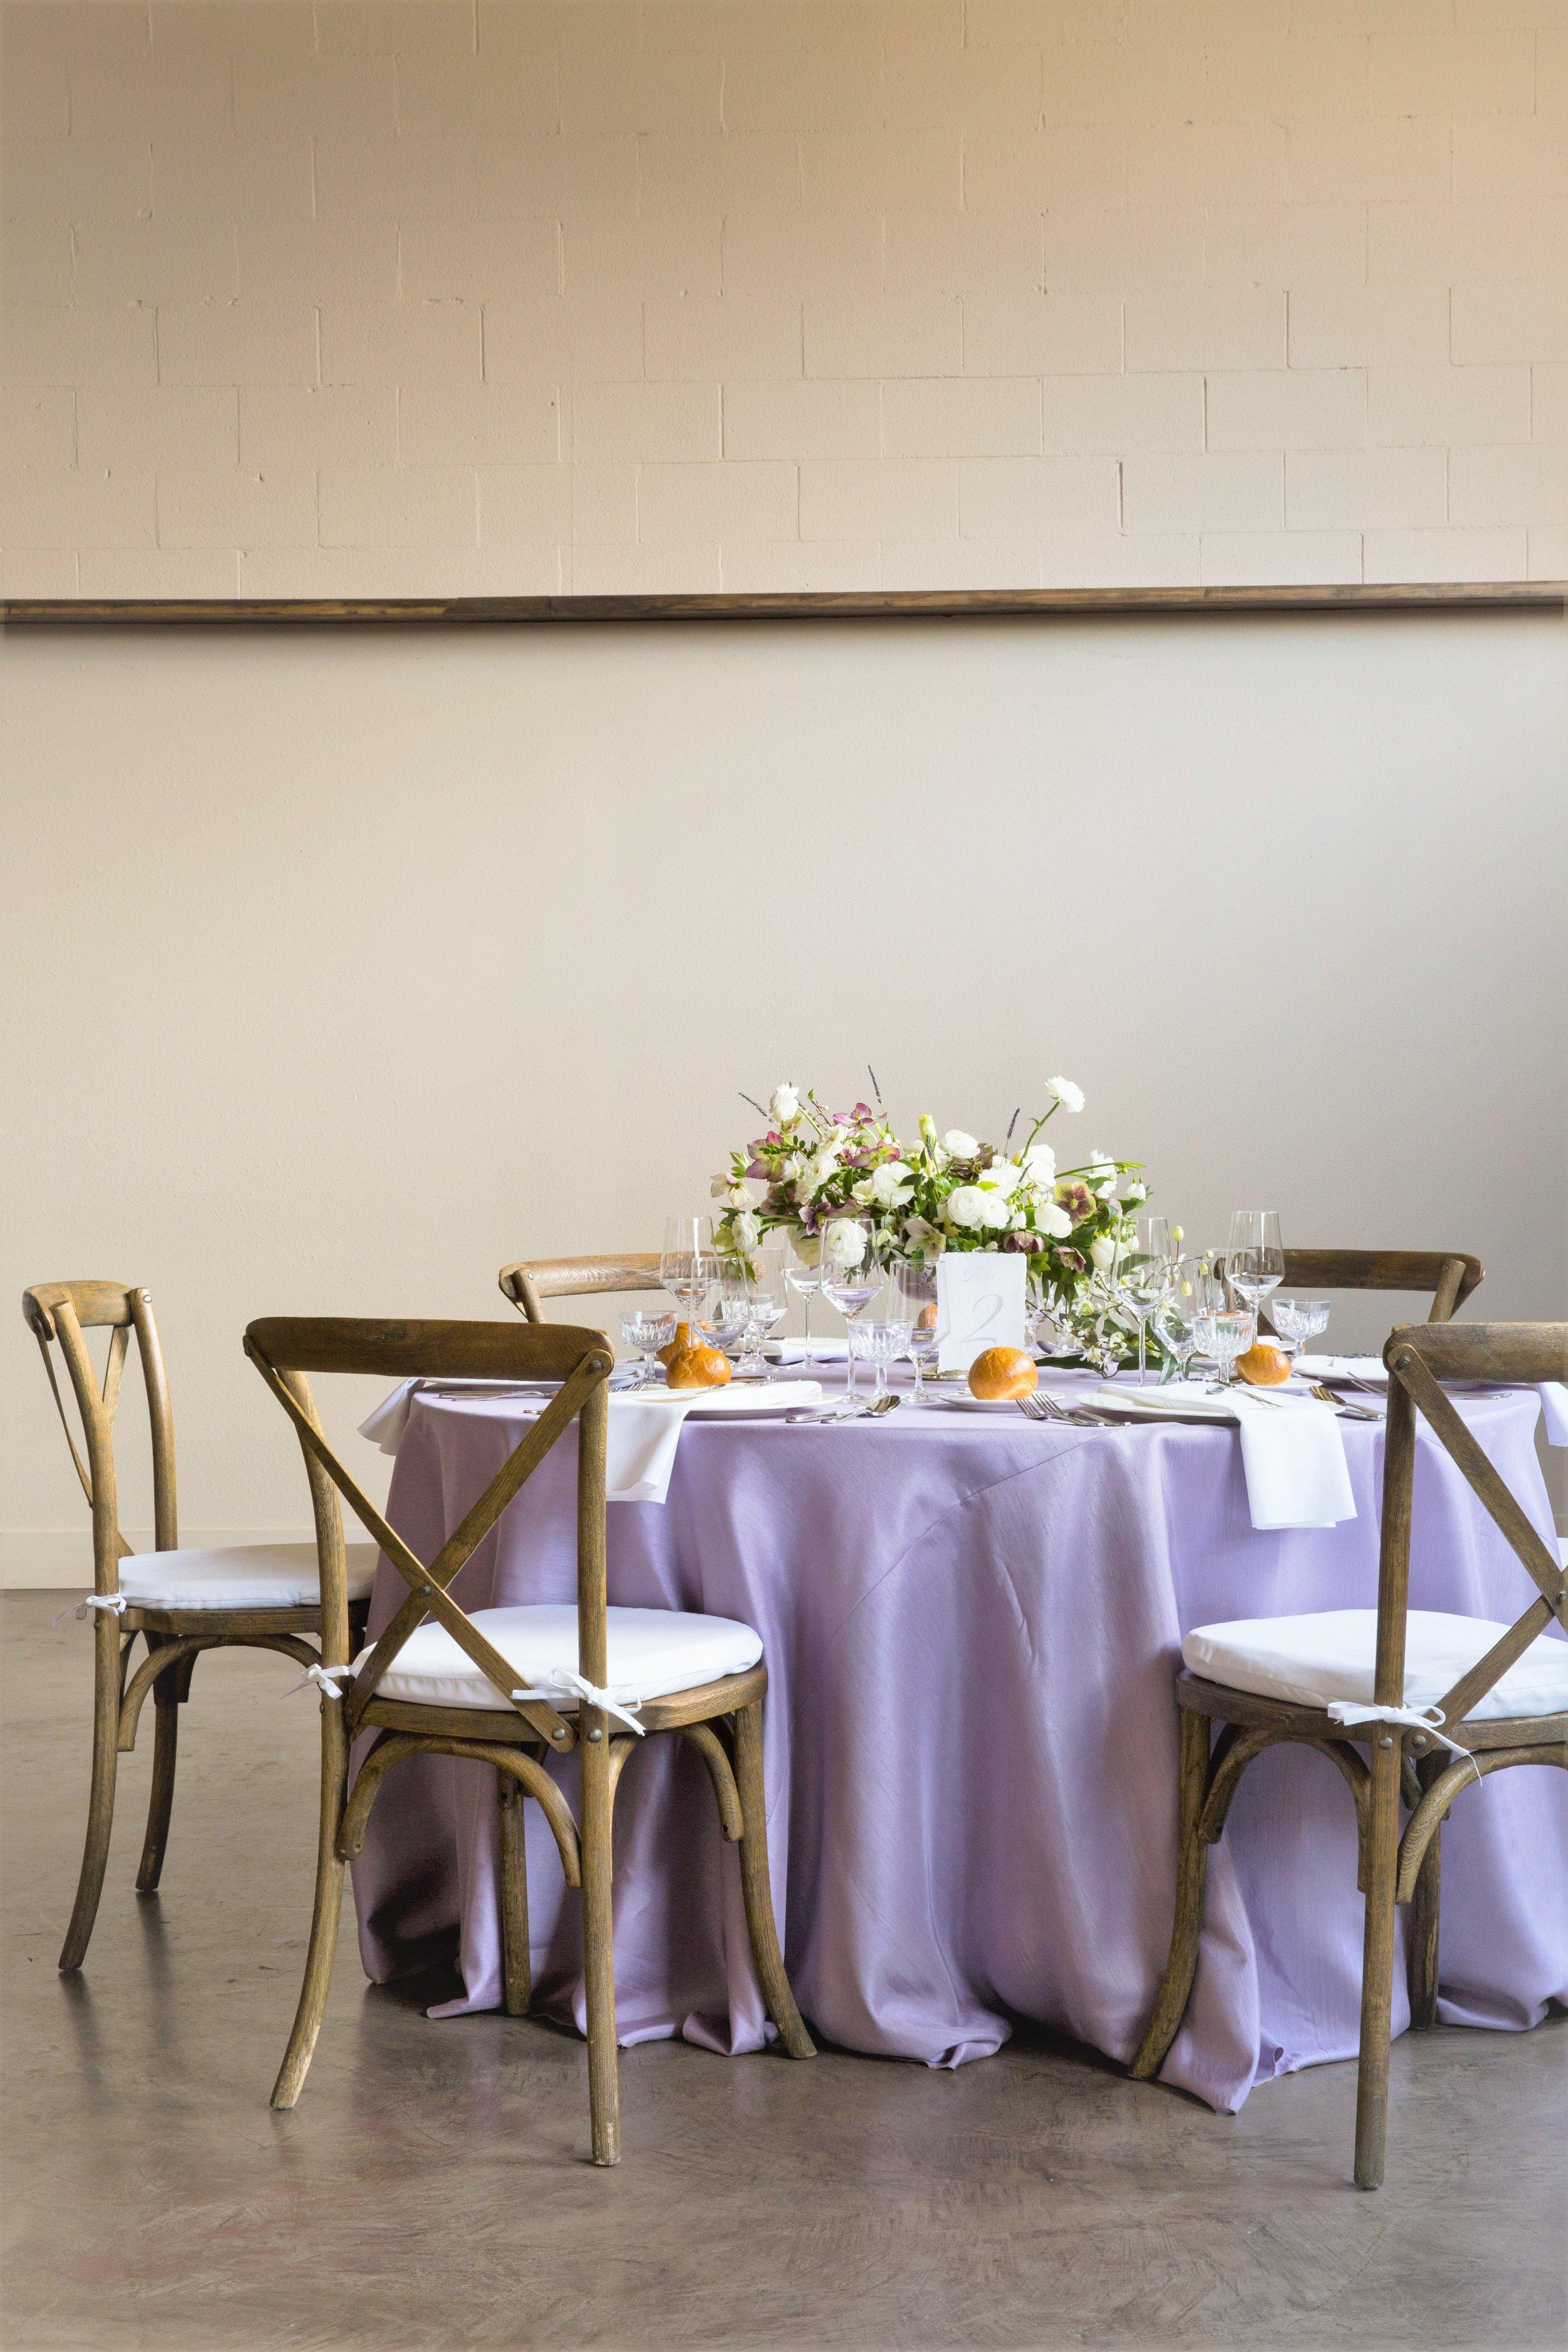 lavender table cloth.jpg